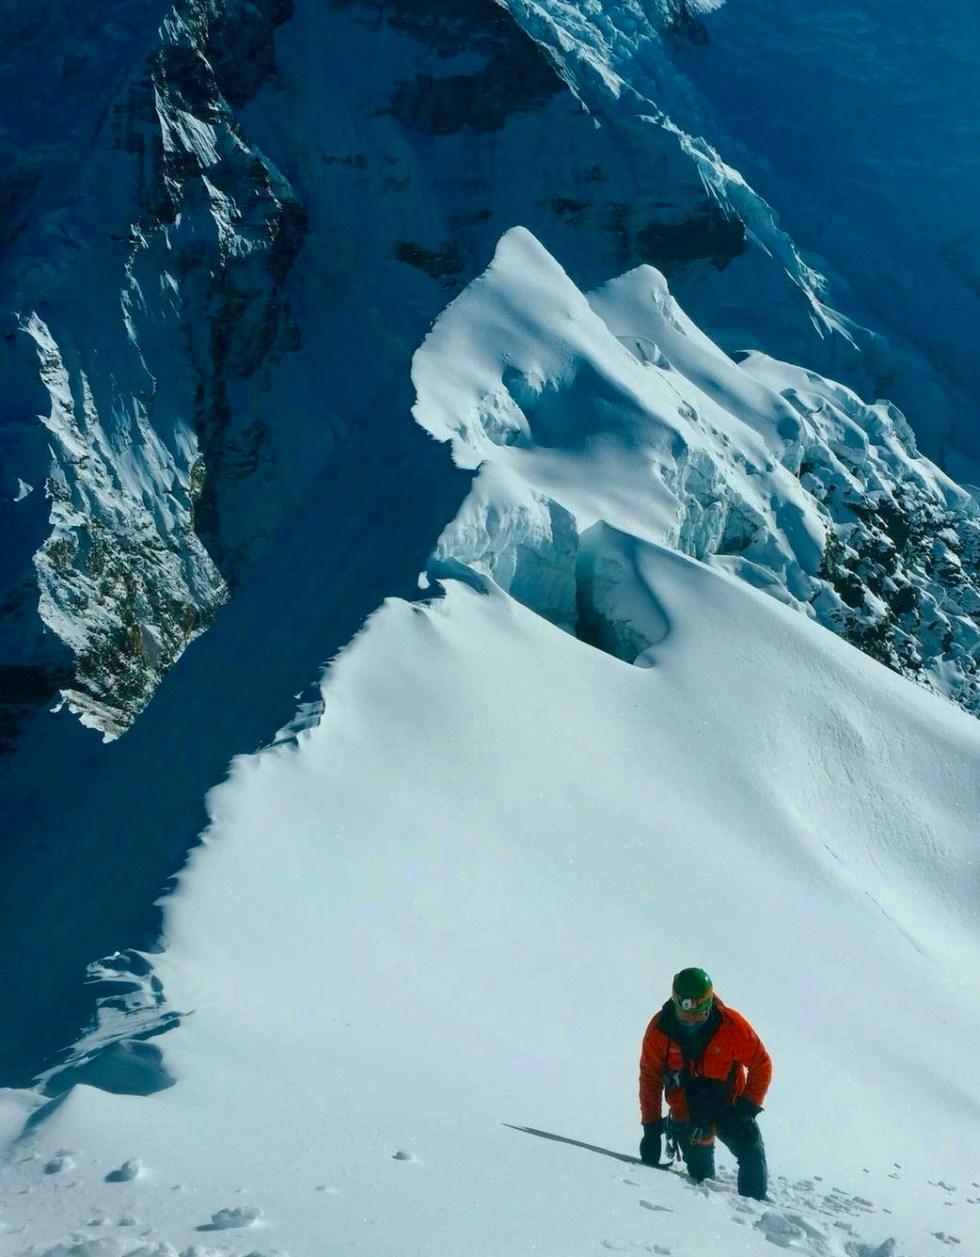 Island Peak, Everest, Alexander HIllary, Everest 2019, Everest 1953, Edmund Hillary Collection